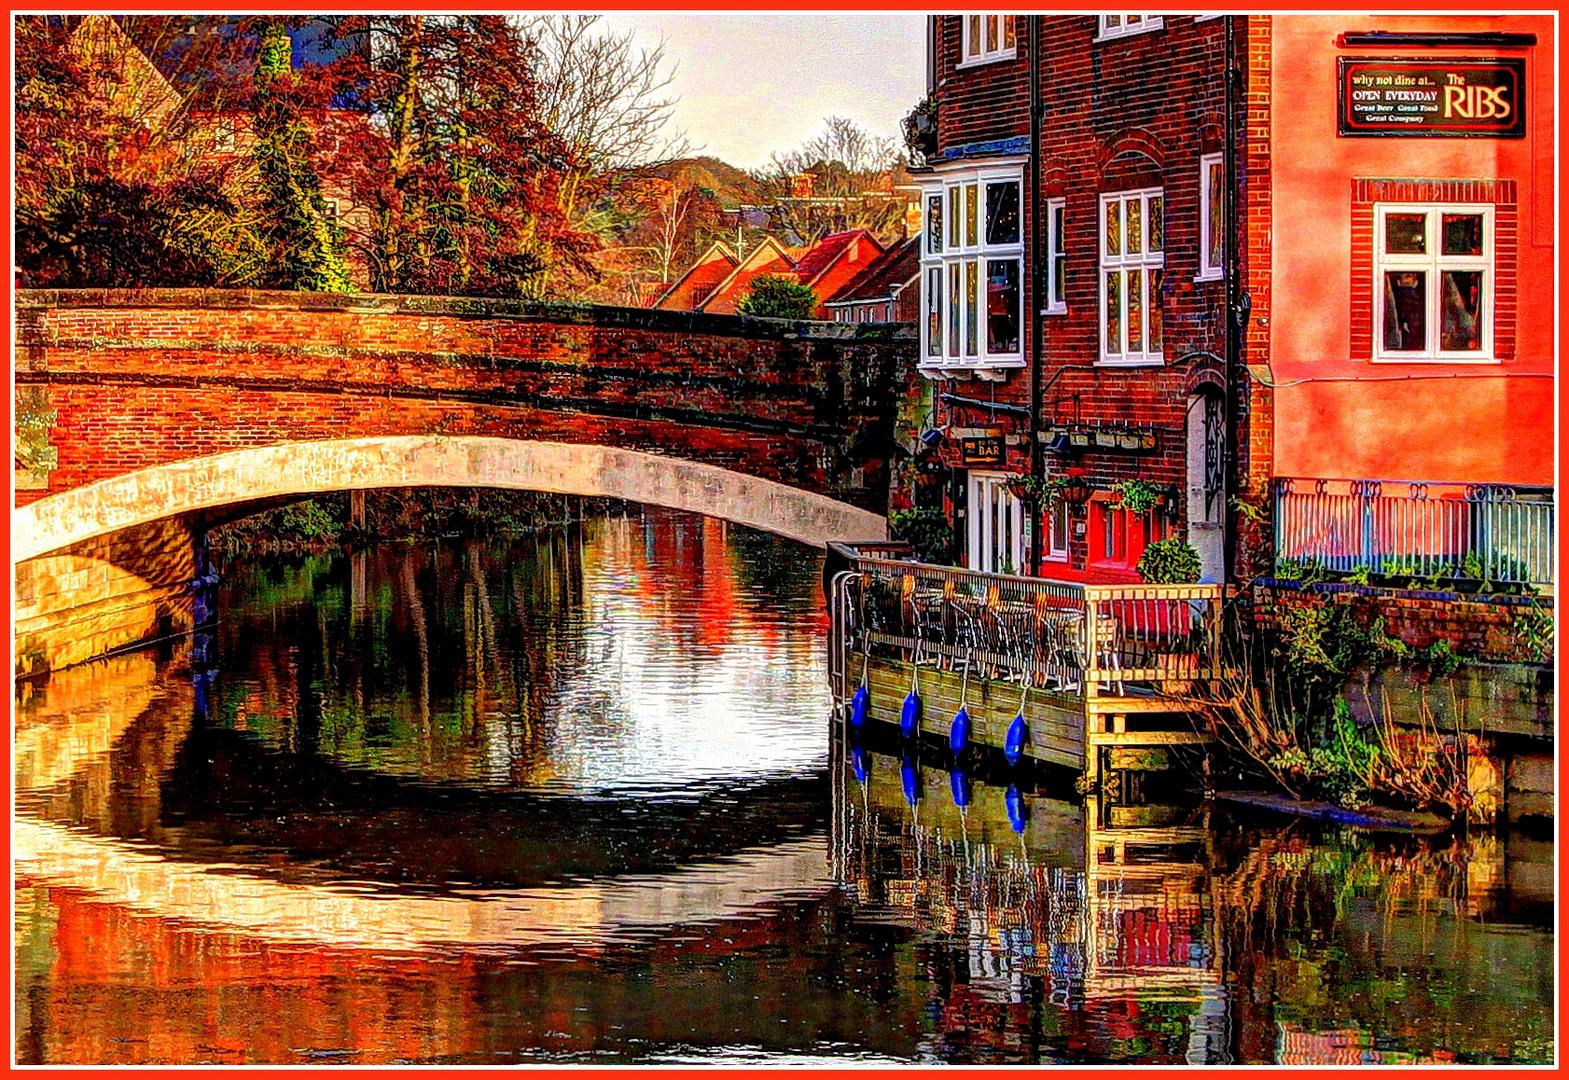 Norwich The Ribs